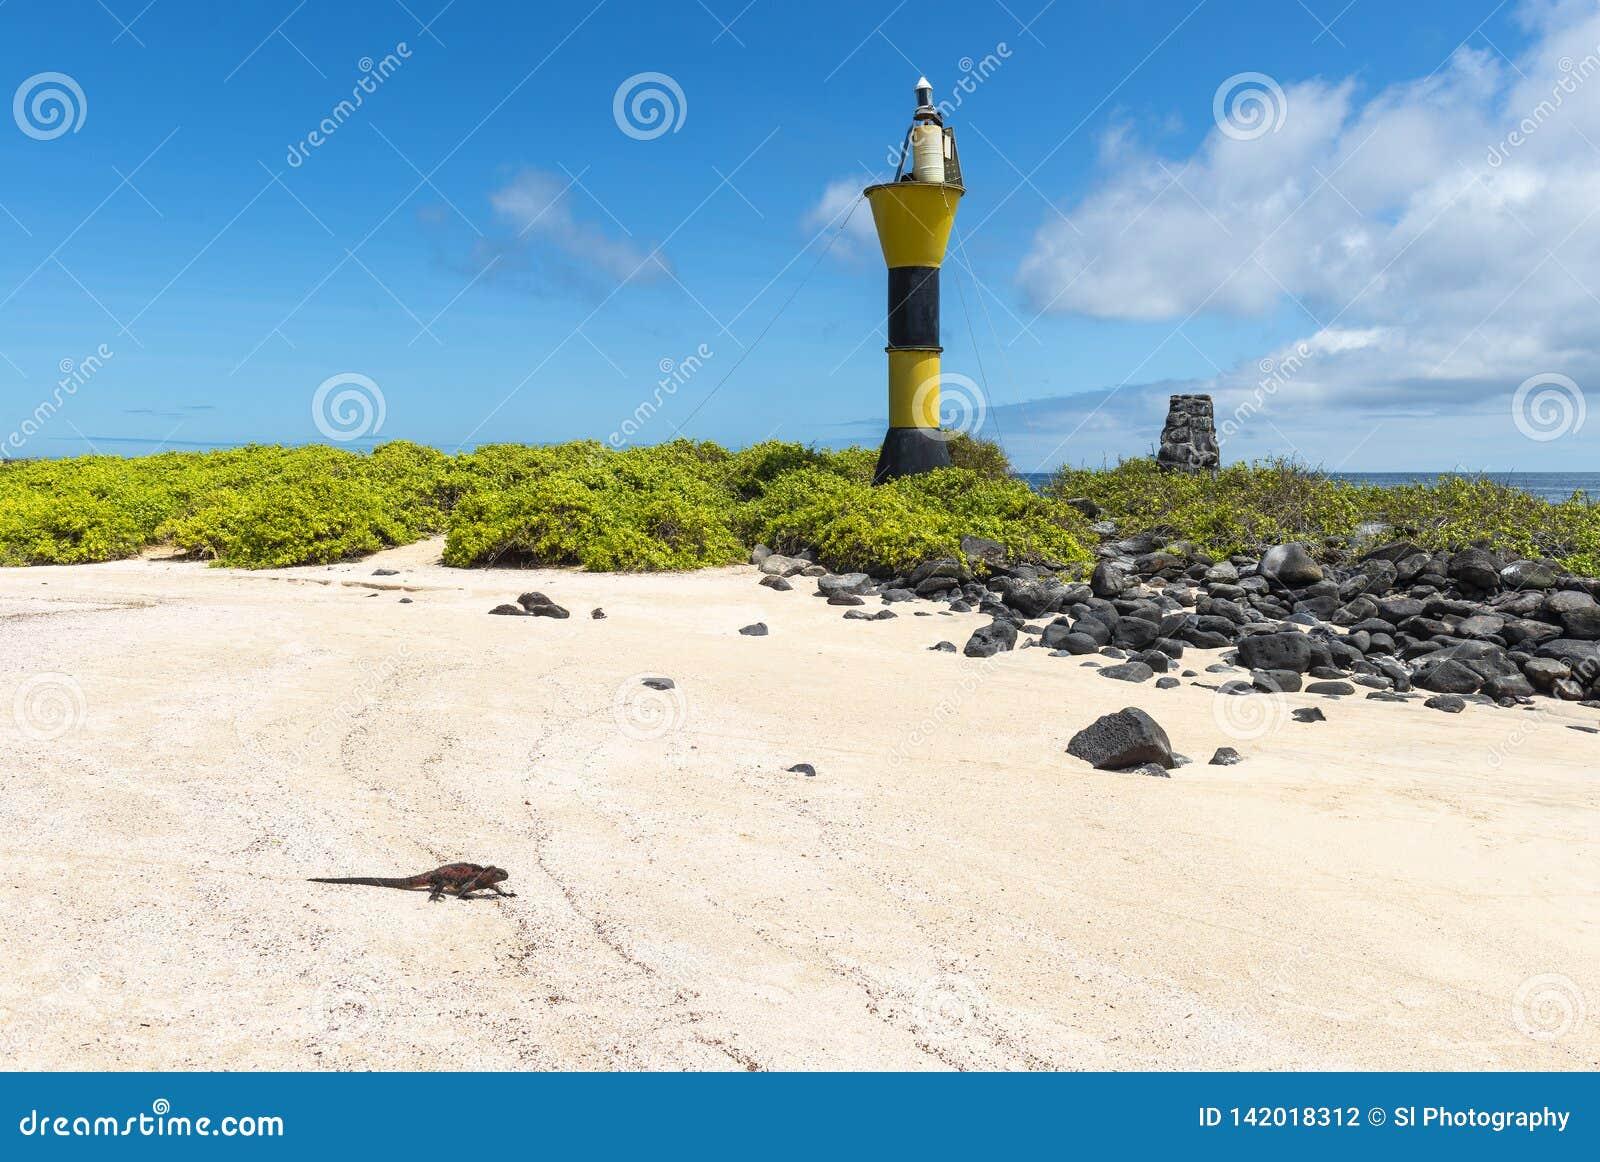 Lighthouse on Espanola Island, Galapagos, Ecuador